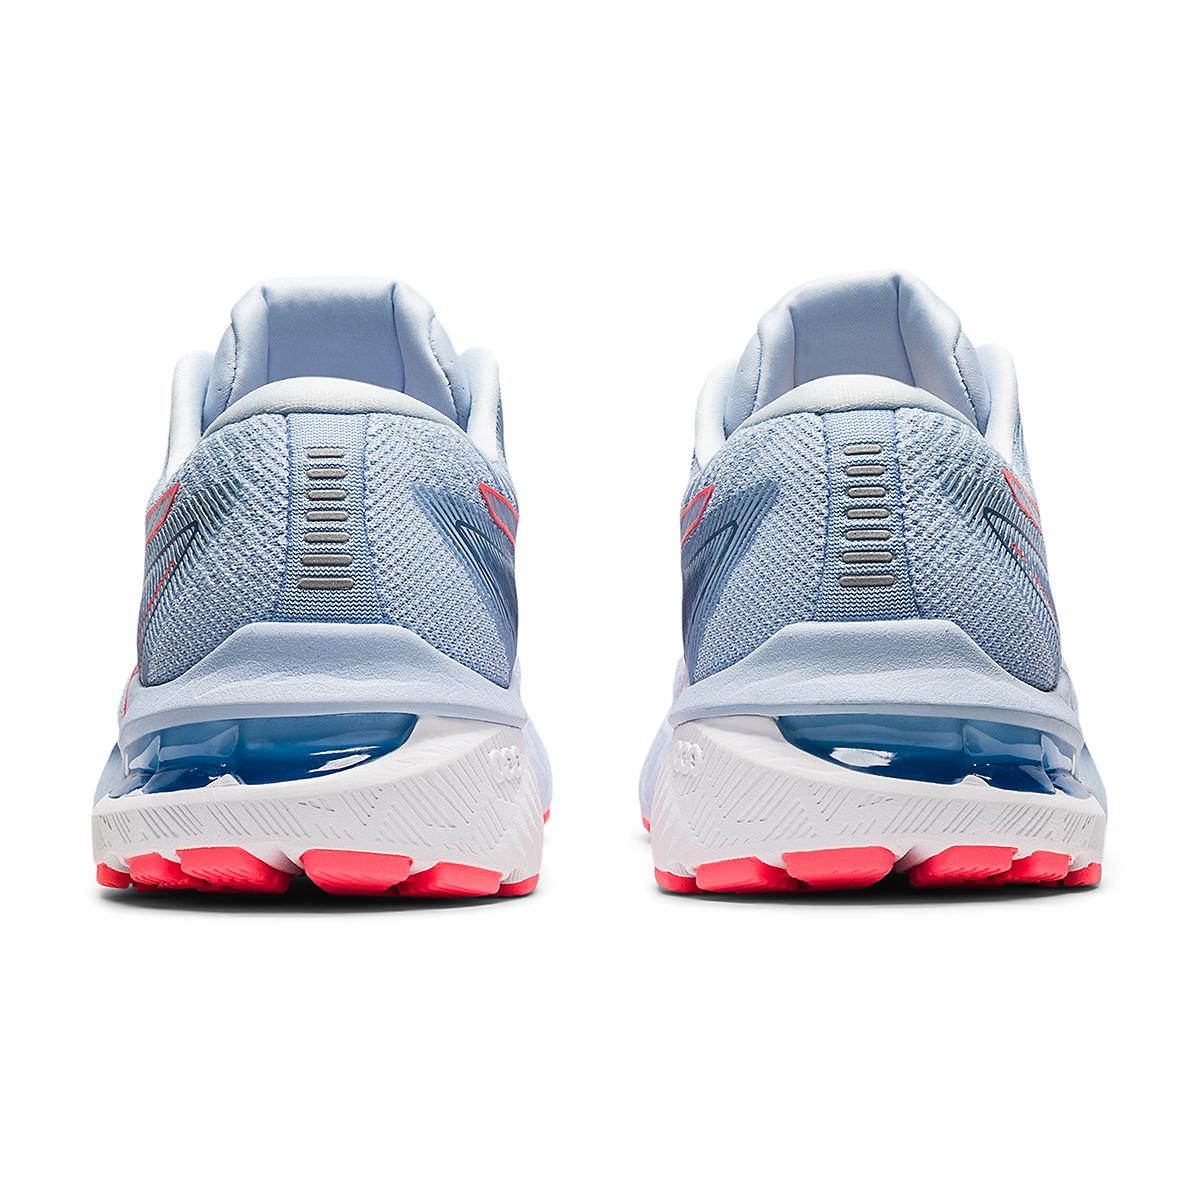 Women's Asics GT-2000 10 Running Shoe - Color: Mist/Blazing Coral - Size: 5 - Width: Regular, Mist/Blazing Coral, large, image 5